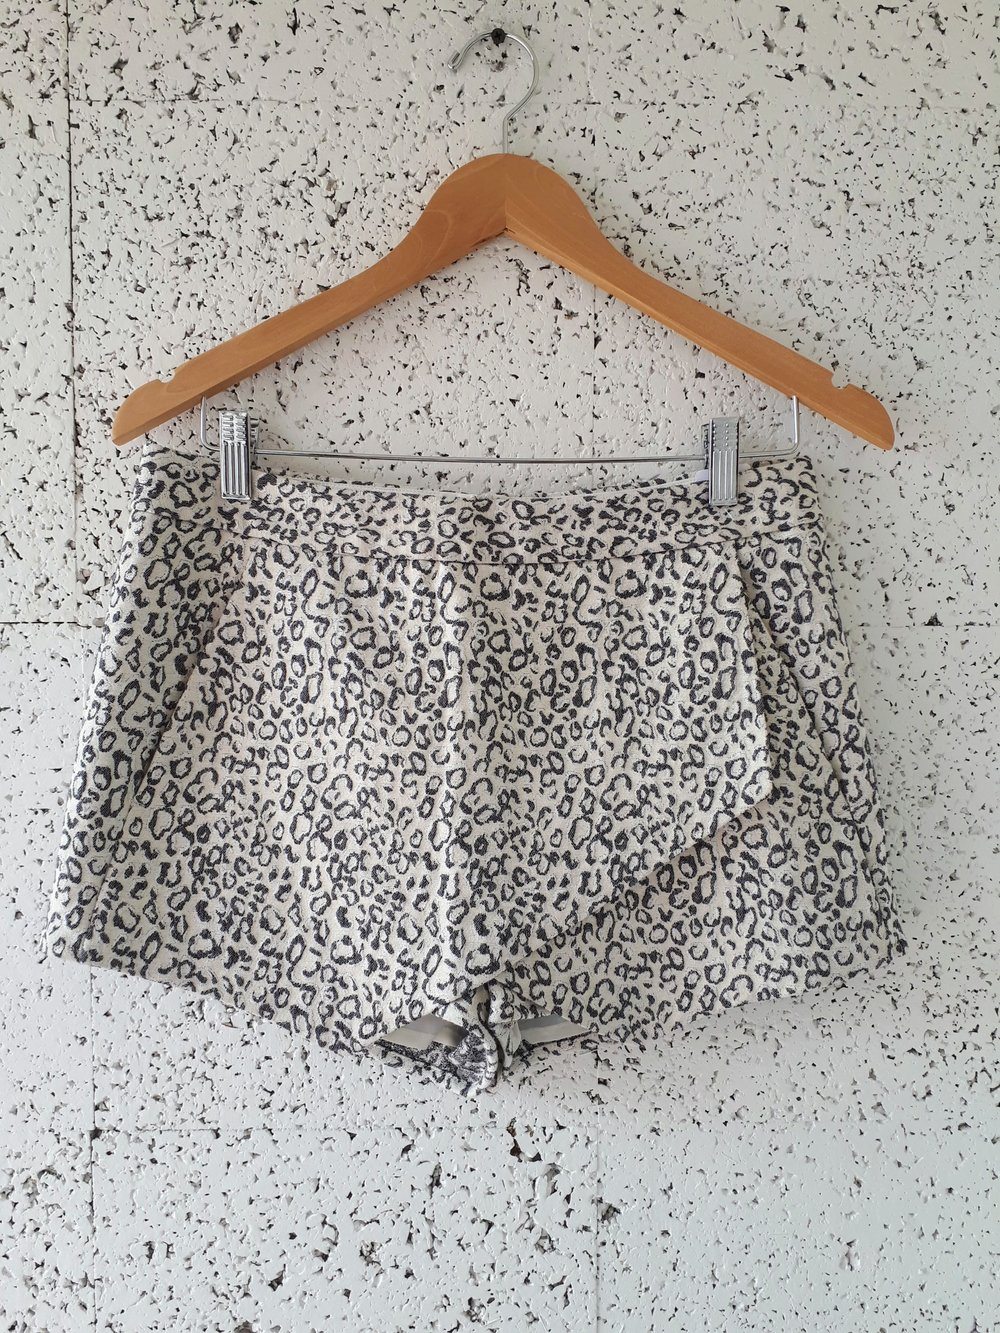 Express shorts; Size 6, $24